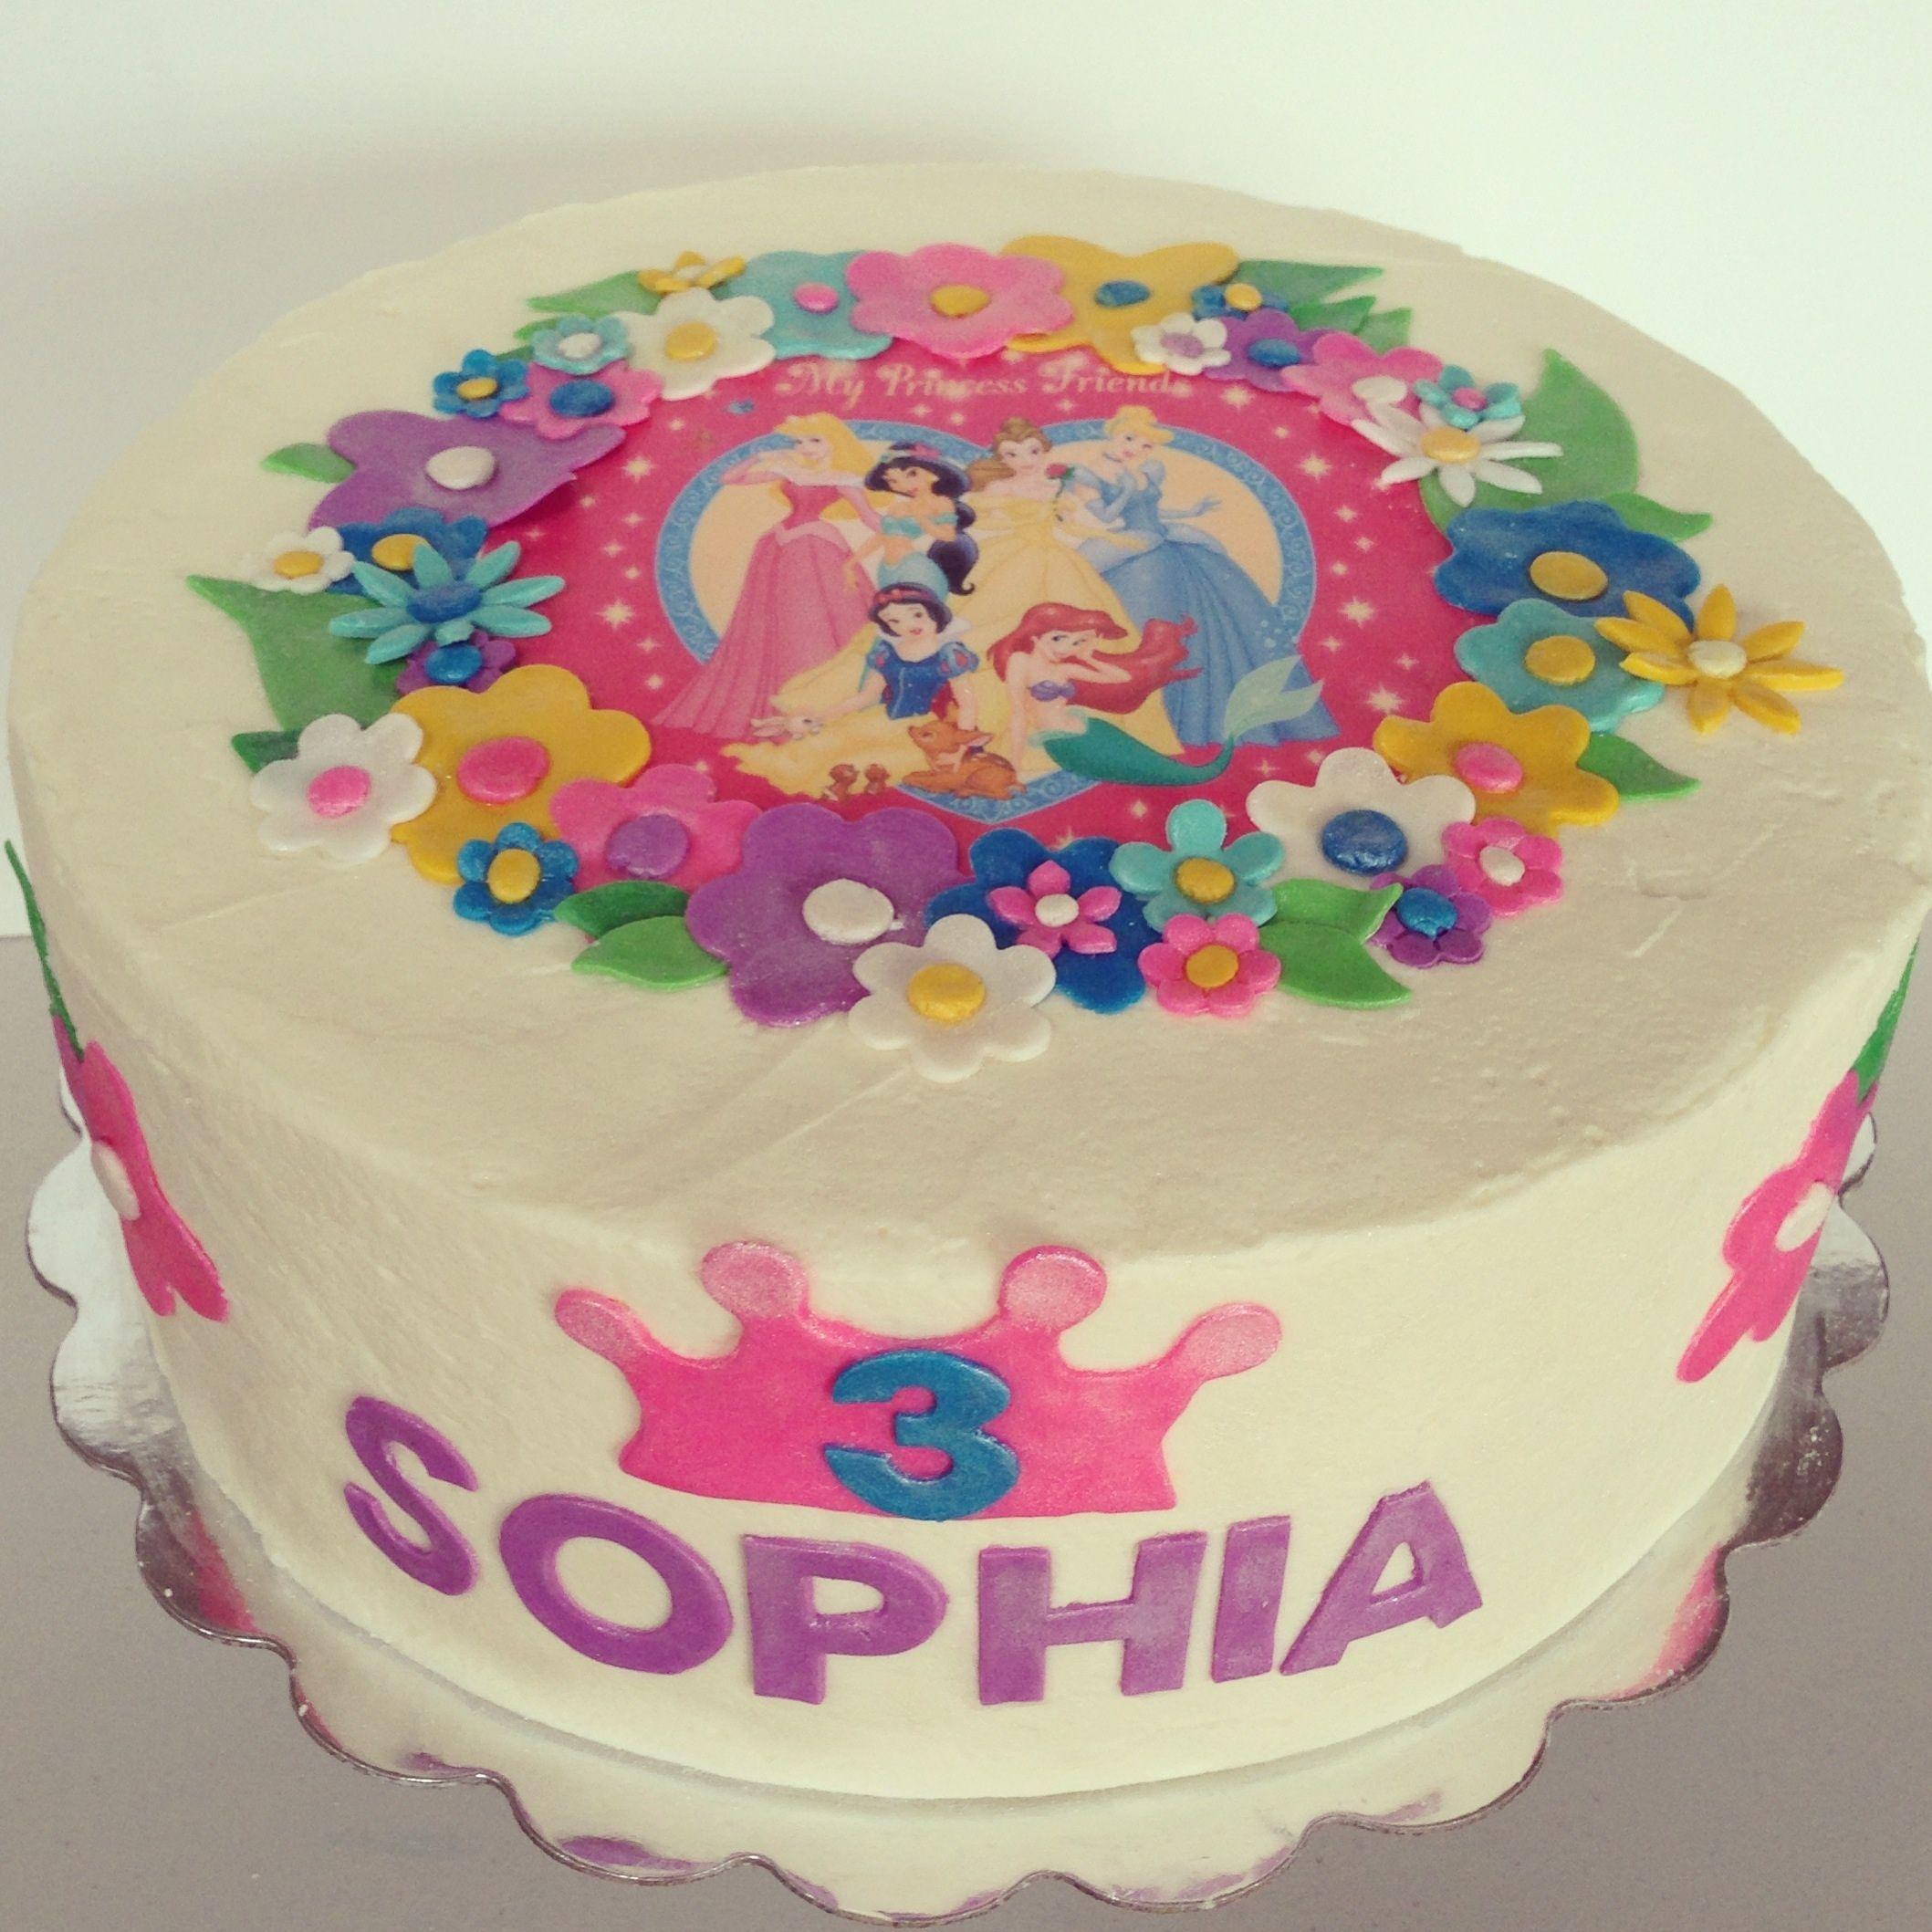 Amazing Disney Princess 3Rd Birthday Cake Gateau Funny Birthday Cards Online Alyptdamsfinfo